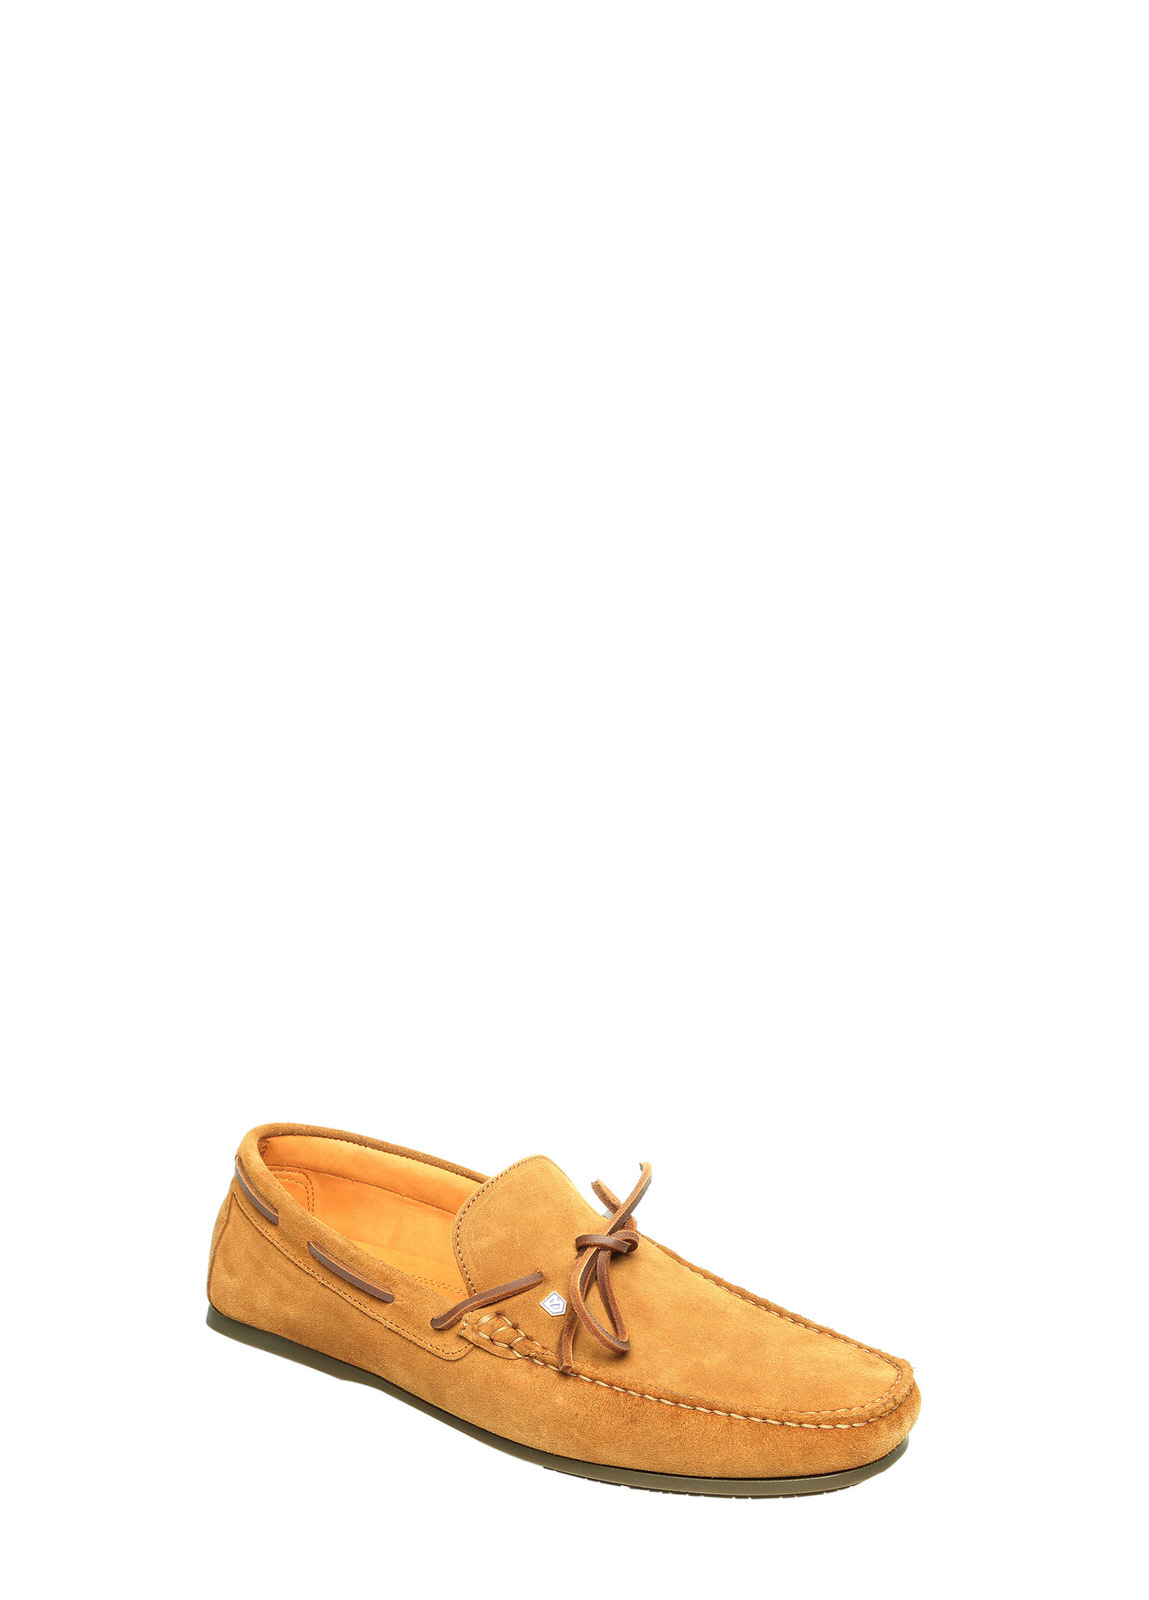 Dubarry_ Corsica Mens Deck Shoe - Camel_Image_1